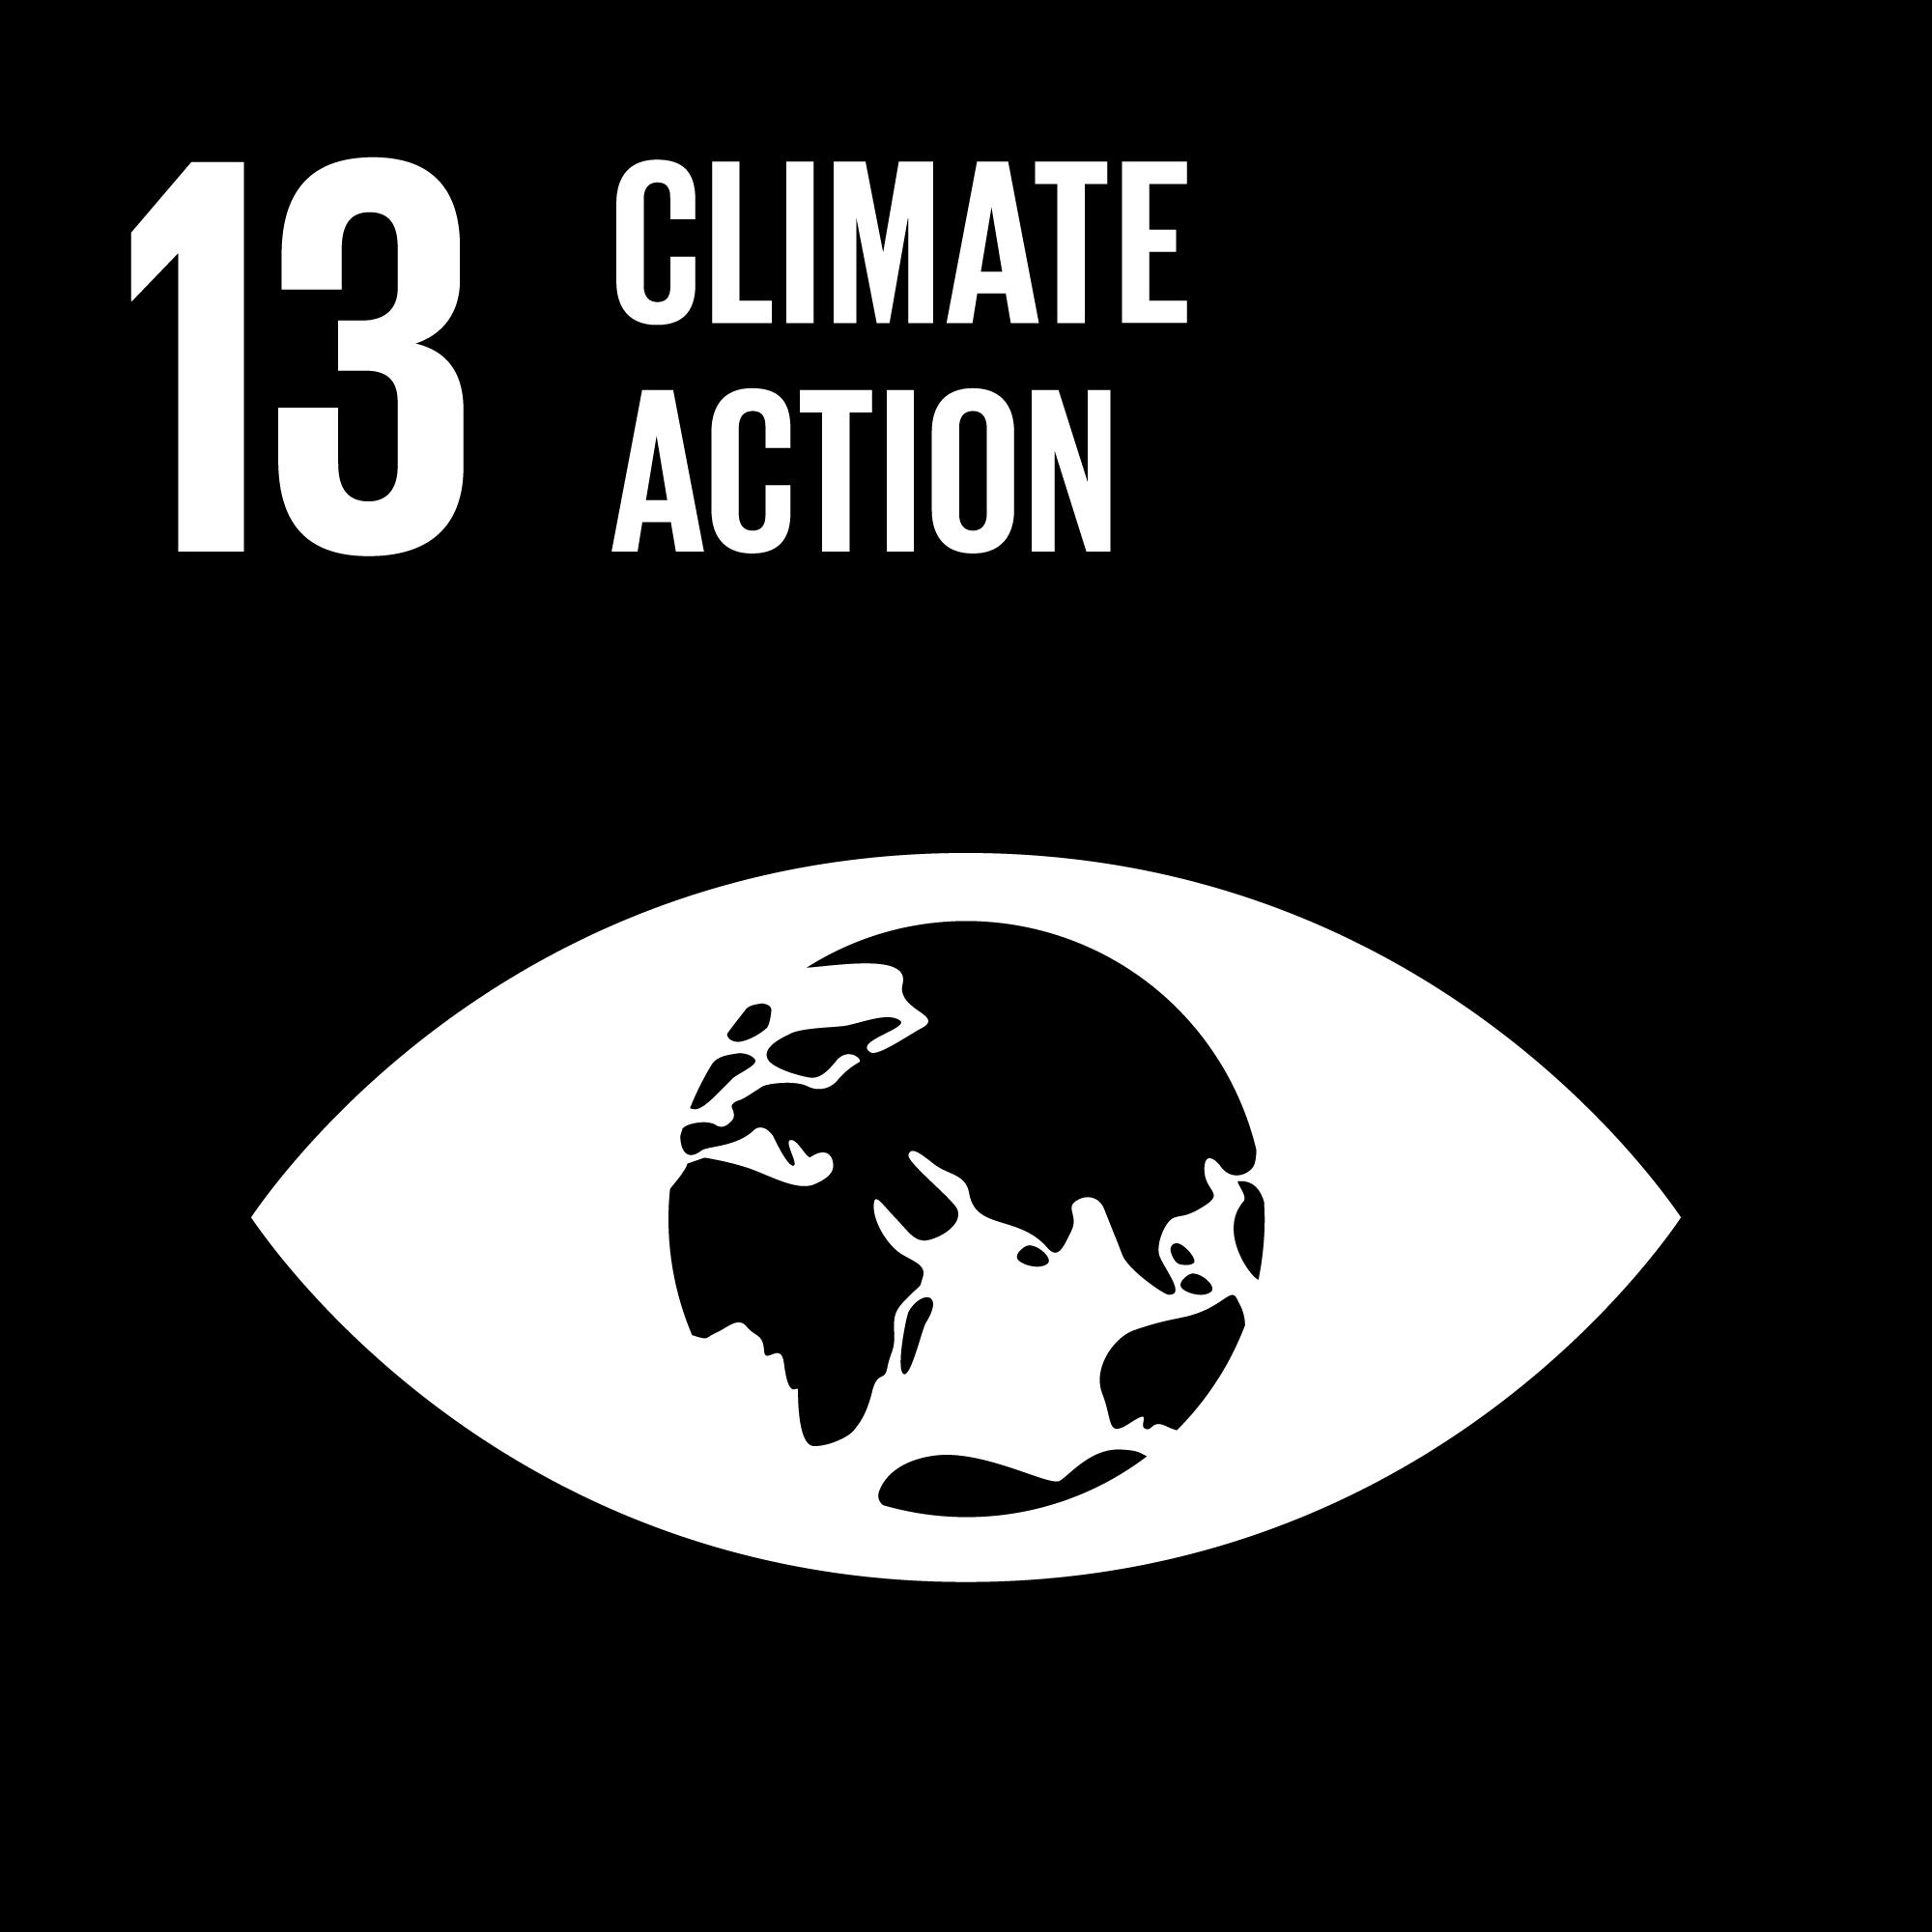 Sustainable Development Goals - 13 - Climate Action